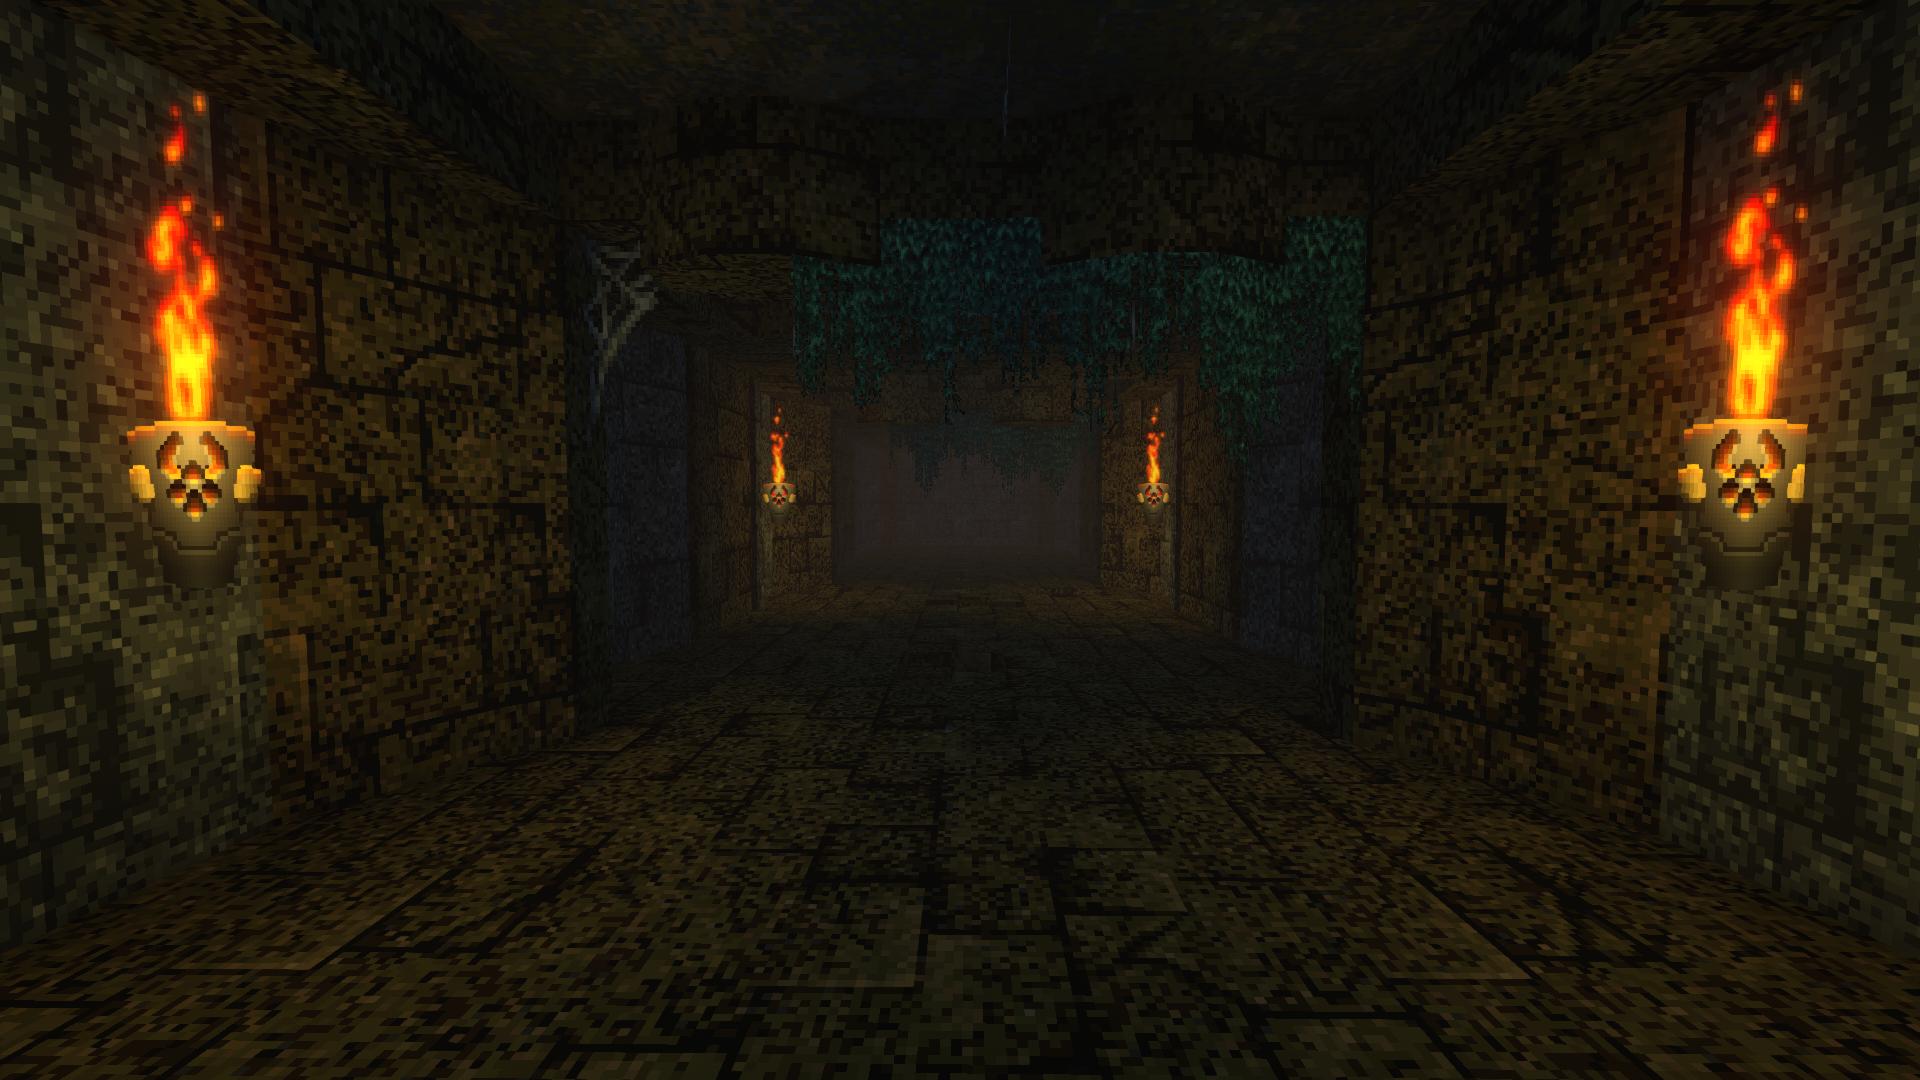 Screenshot_Doom_20210528_001151.png.12ee801f492aed5e3bbaa4f3e7173f9e.png